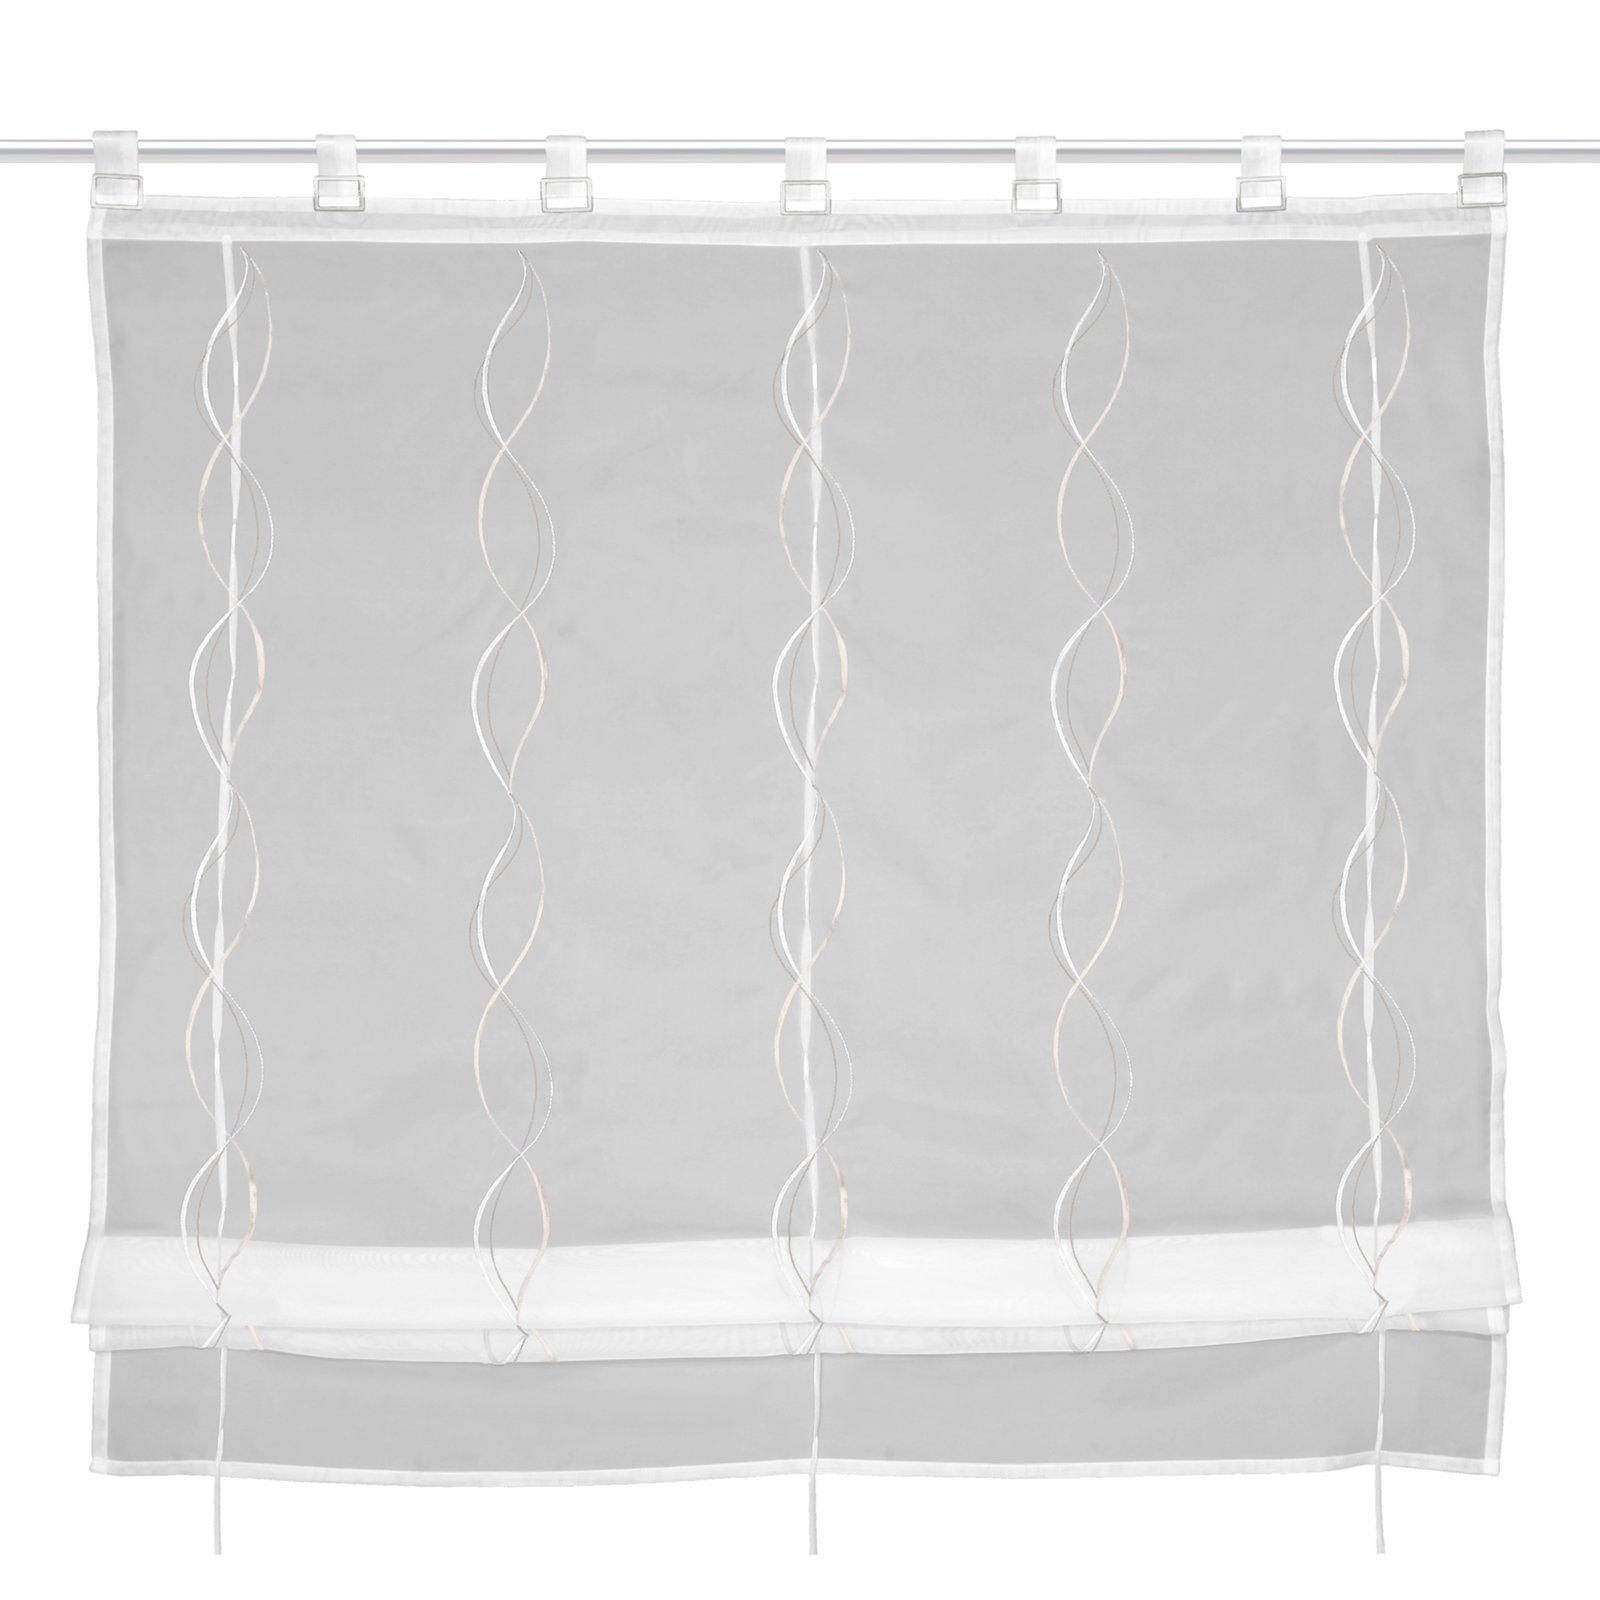 raffrollo wei beige 100x140 cm transparente raffrollos raffrollos rollos jalousien. Black Bedroom Furniture Sets. Home Design Ideas